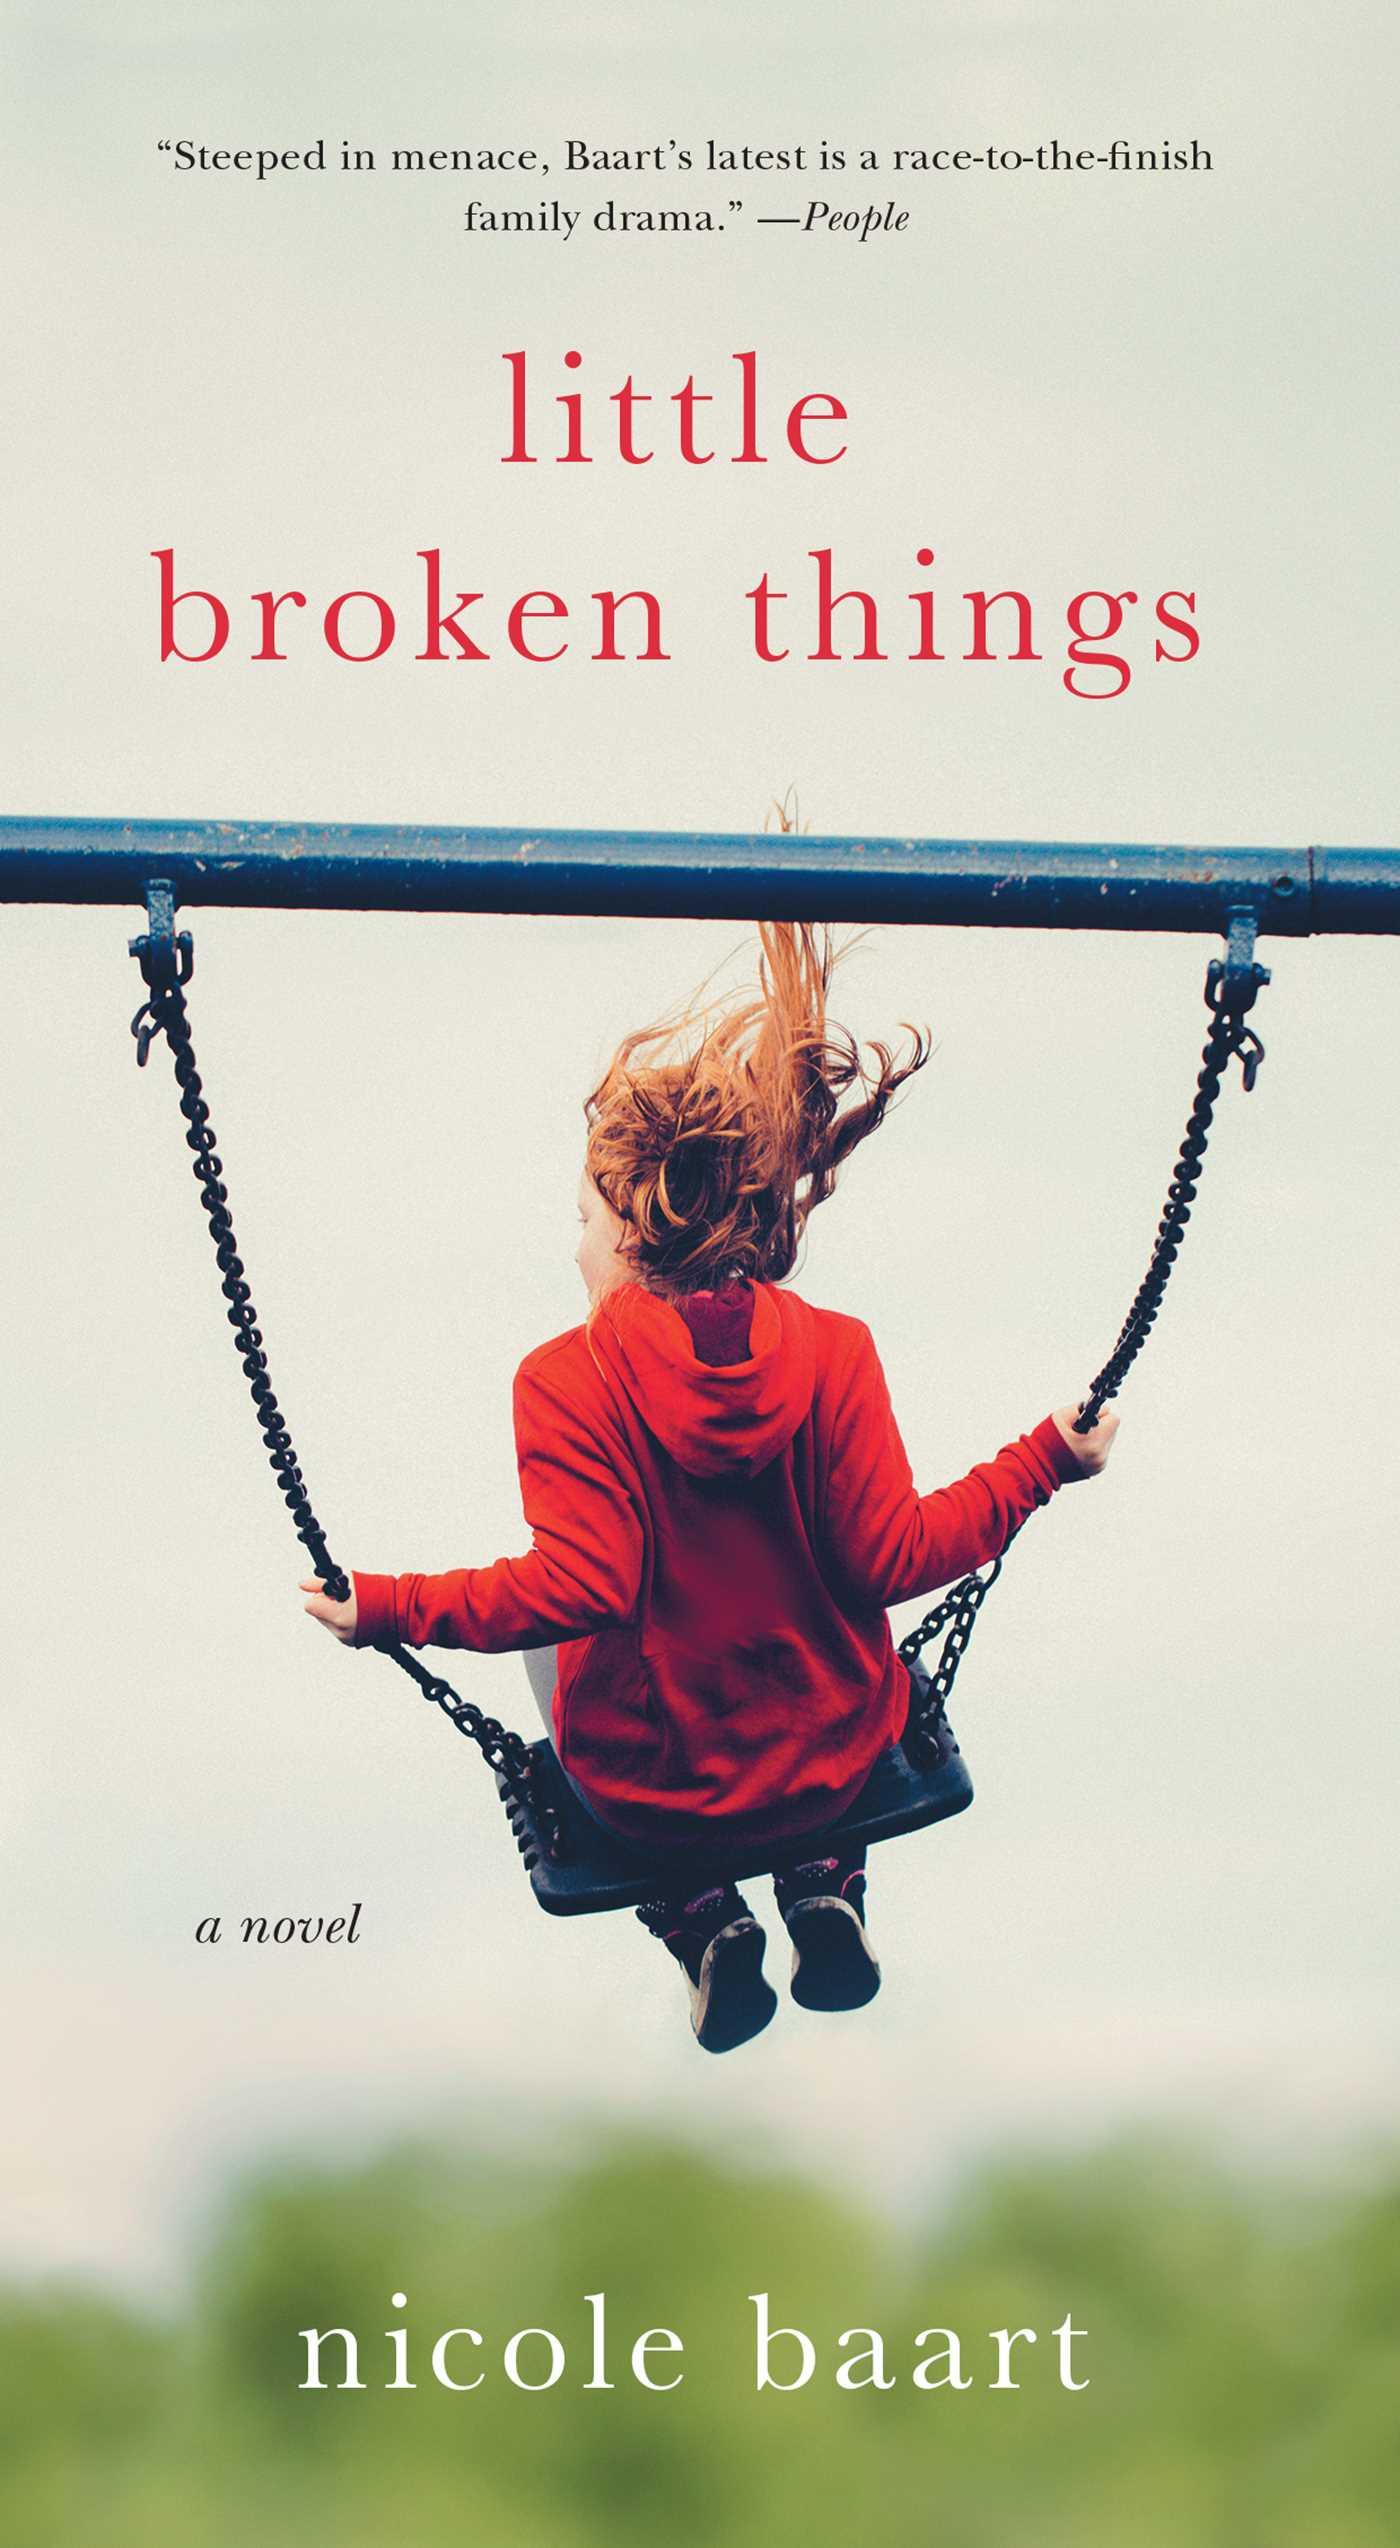 Little broken things 9781501133619 hr